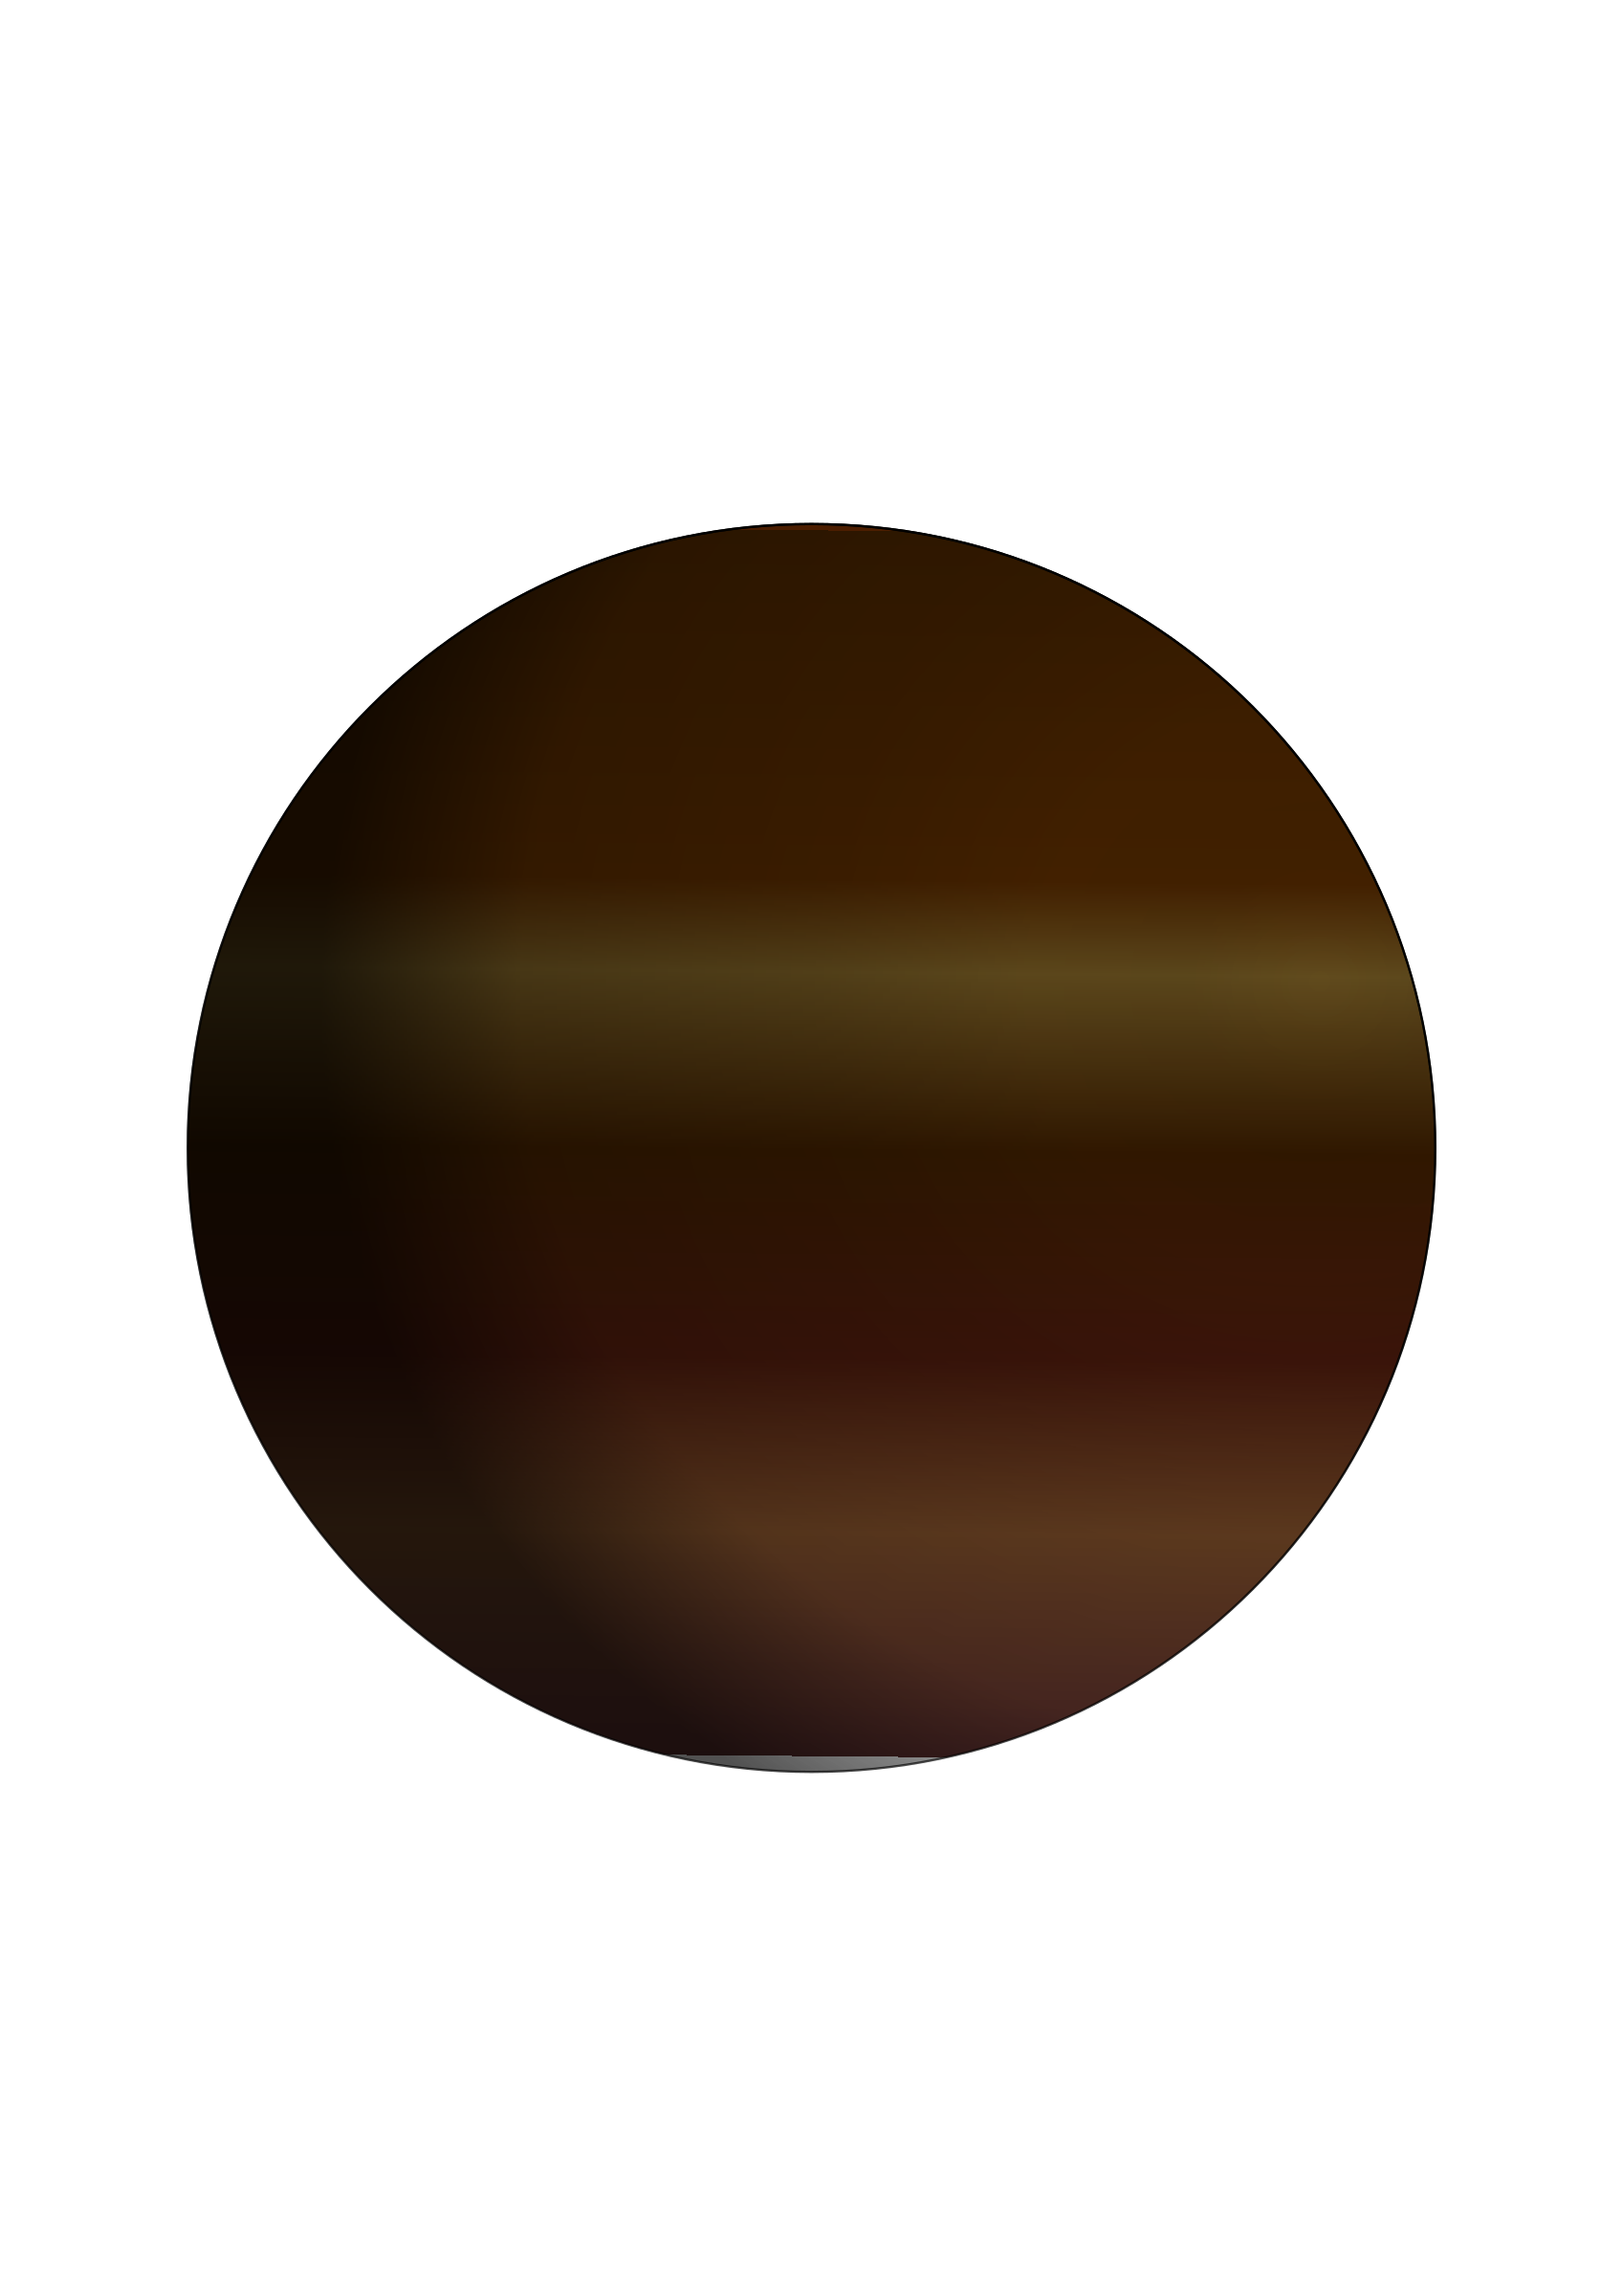 mercury planet clipart - photo #18